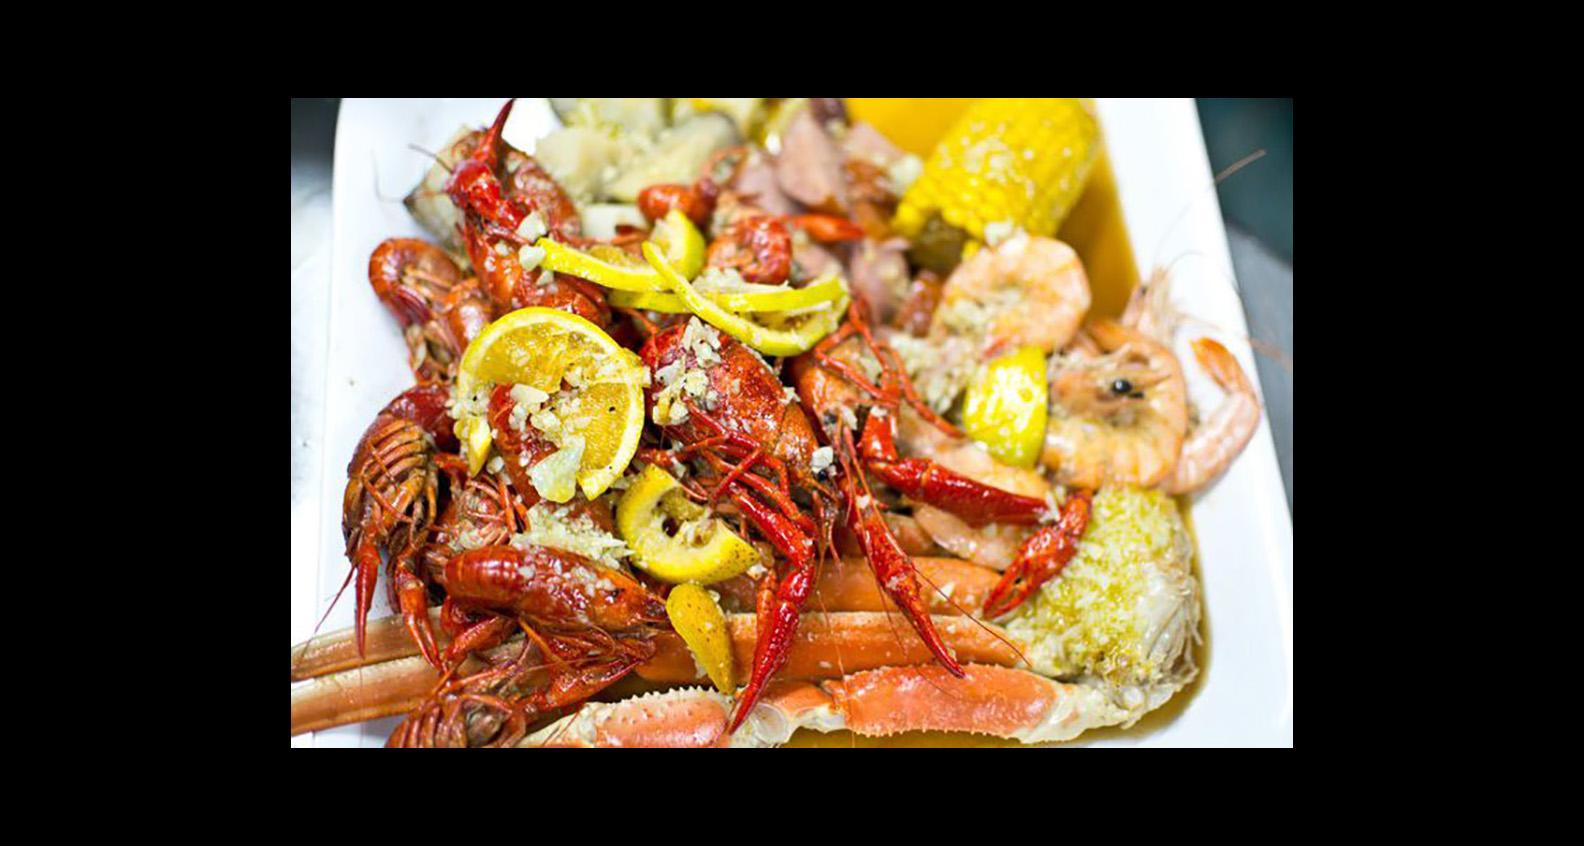 King Cajun Crawfish of Orlando